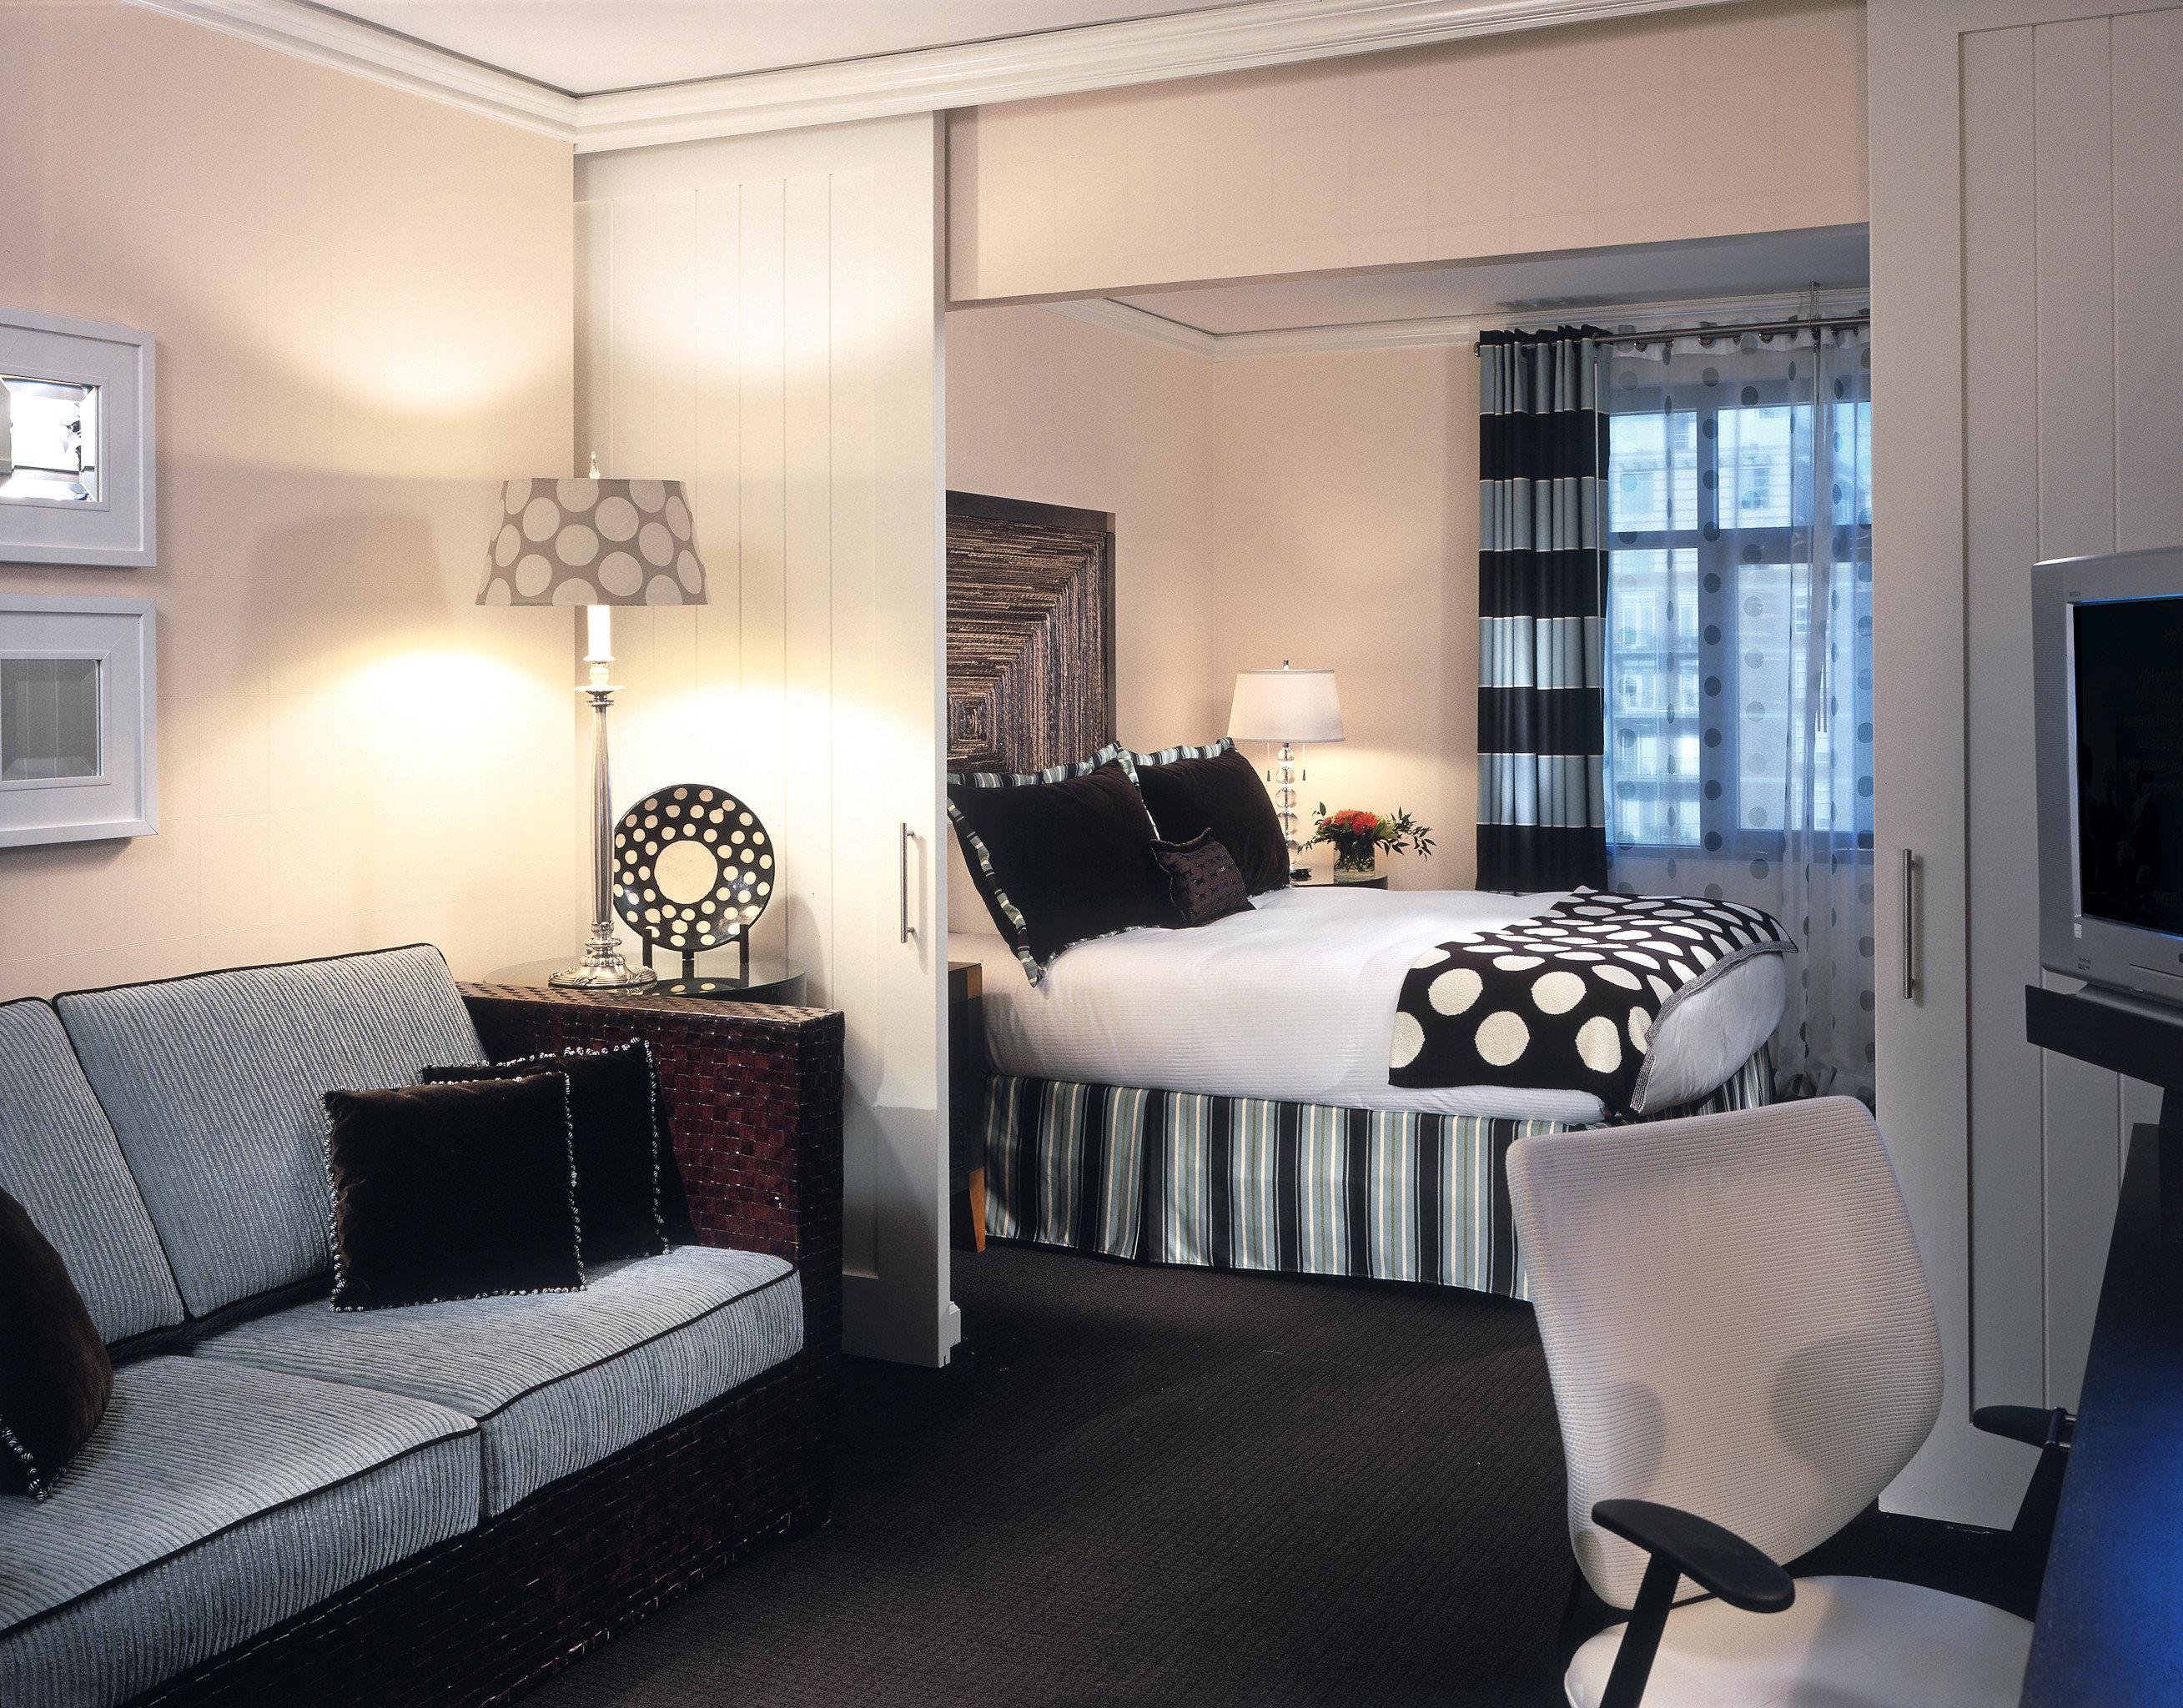 Bedroom Hotels Modern Suite sofa property living room home condominium cottage